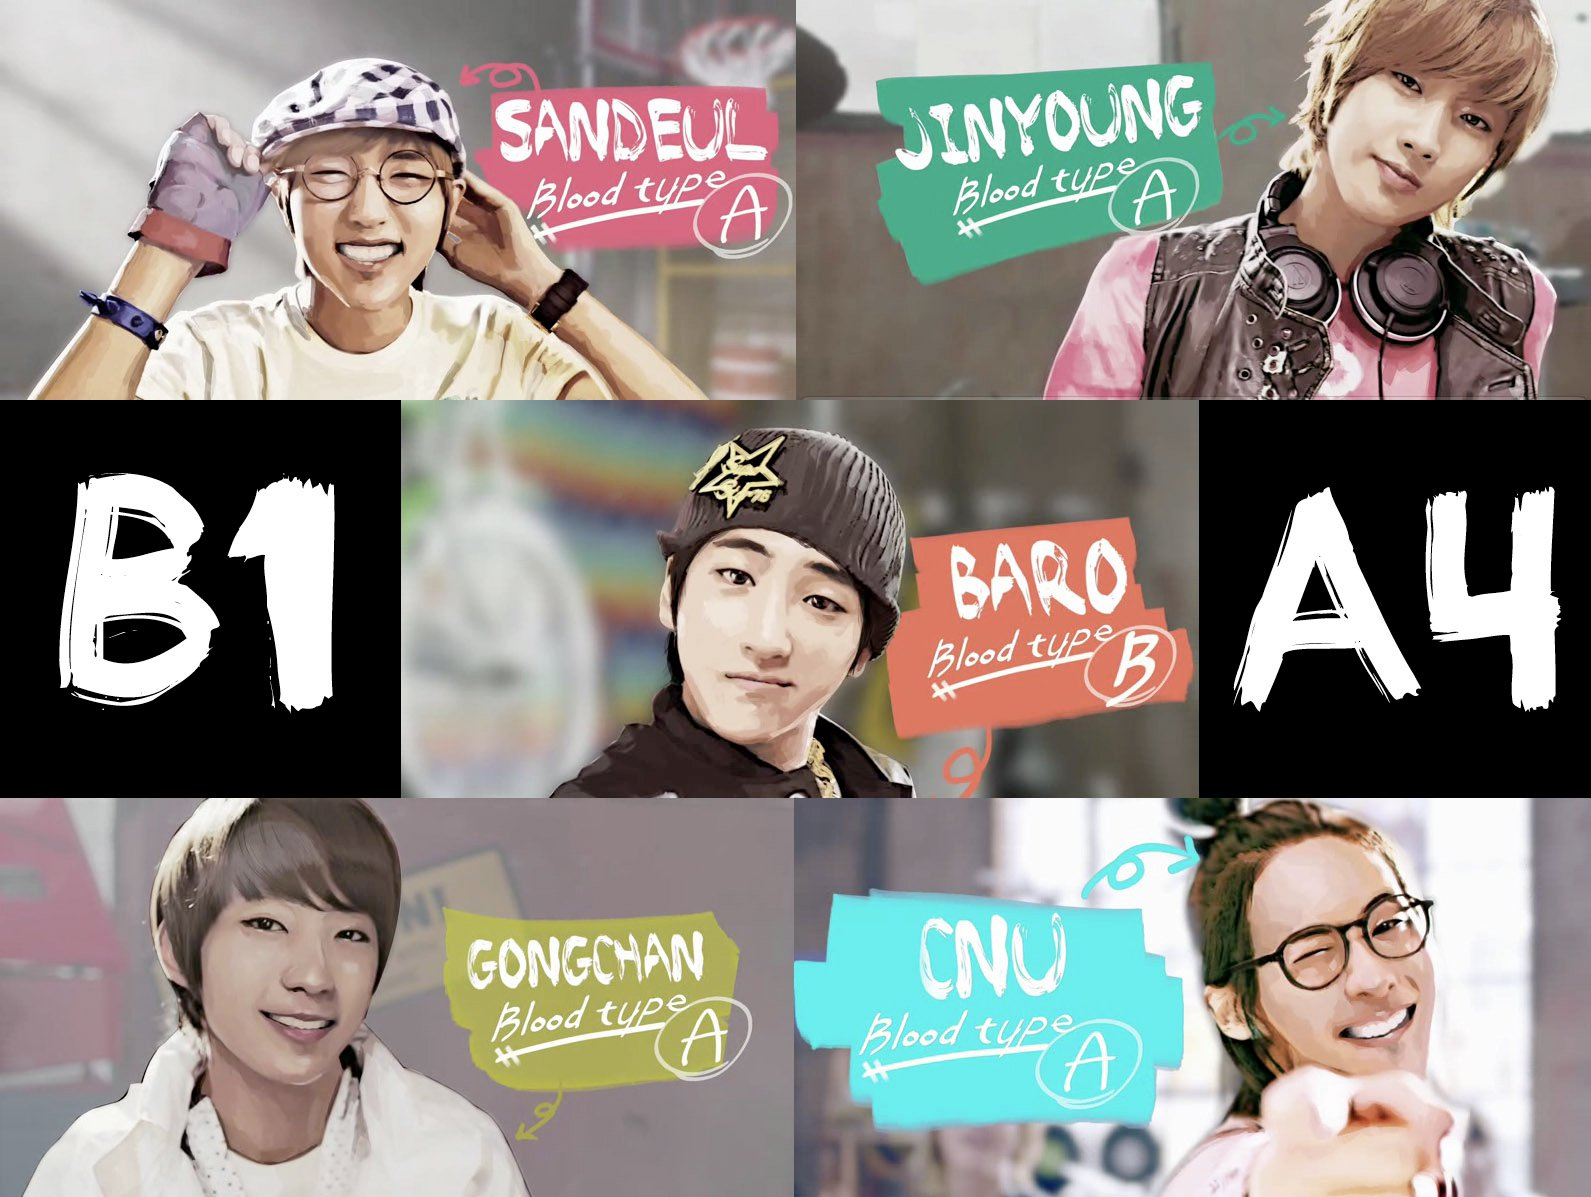 k-pop: b1a4 B1a4 Names